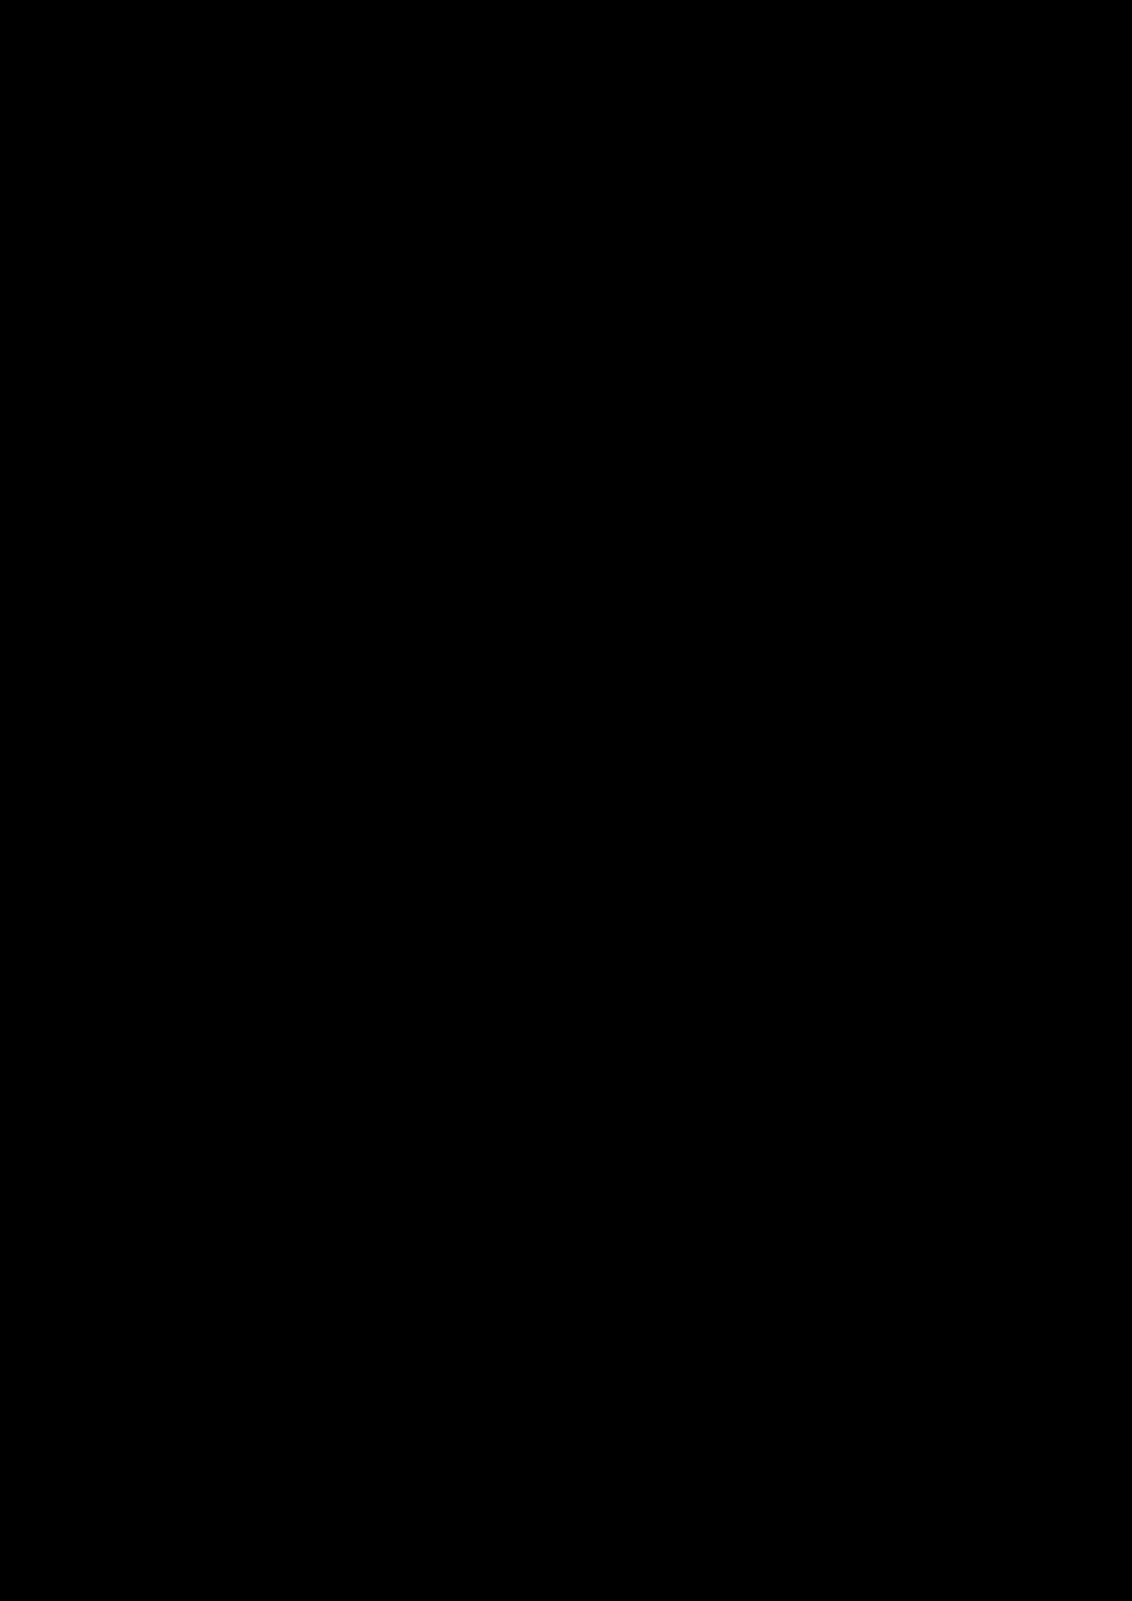 Ispoved Pervogo Boga slide, Image 5